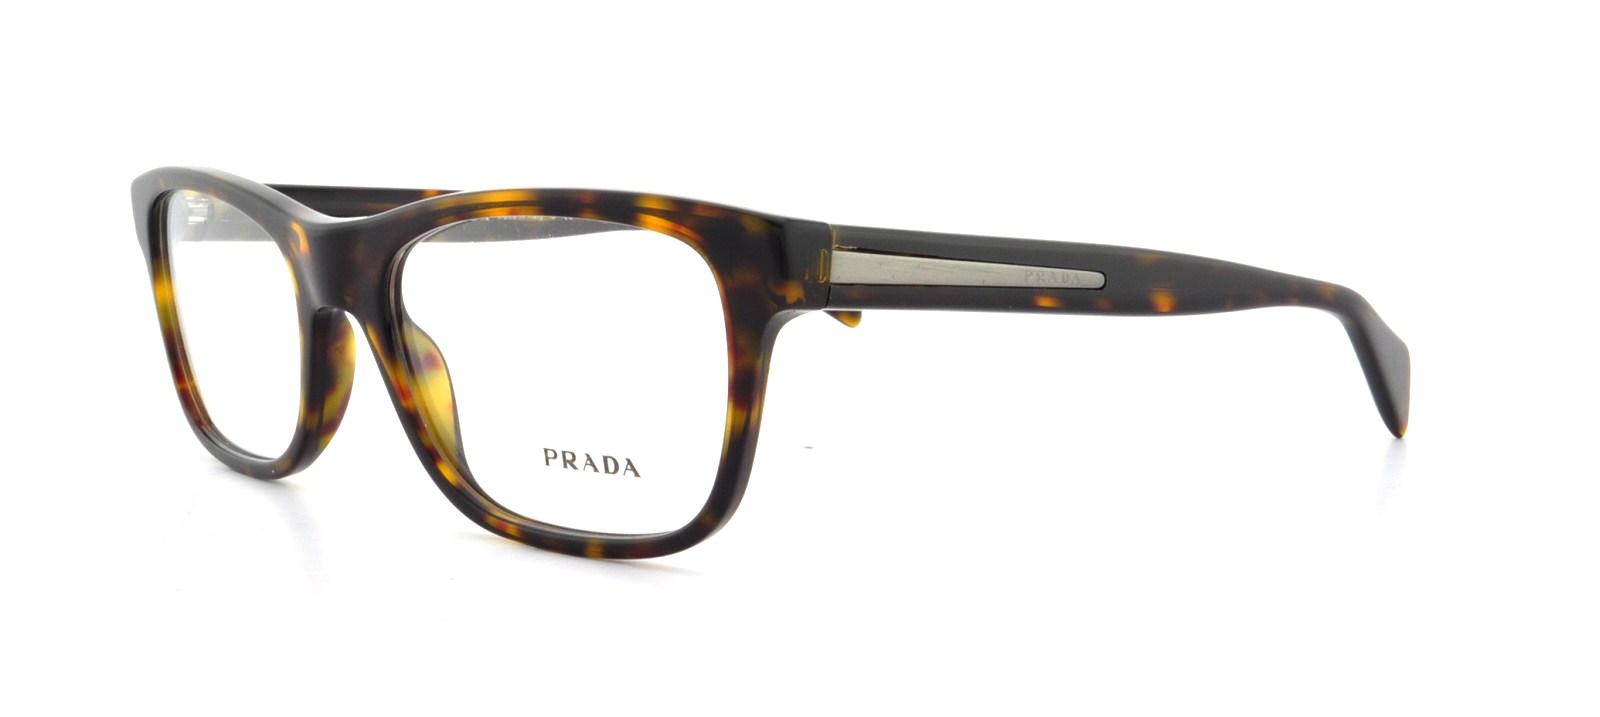 Picture of Prada PR19PV